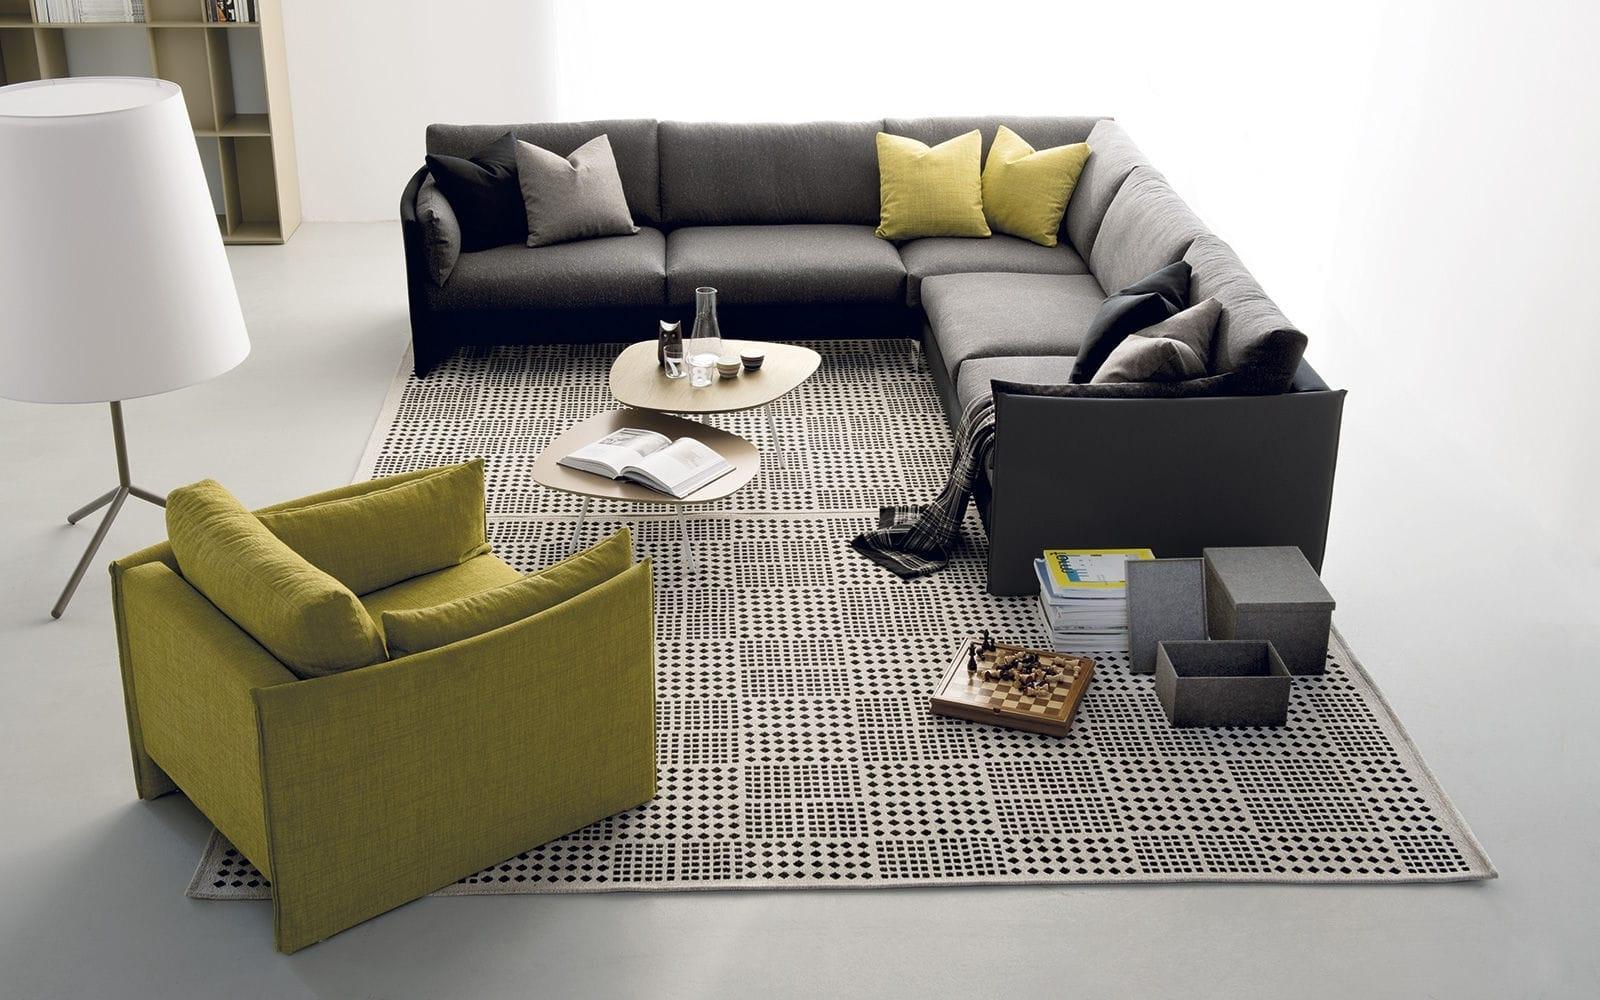 Well Liked Modular Sofa / Corner / Contemporary / Fabric – Urbanbernhardt Inside Contemporary Fabric Sofas (View 20 of 20)